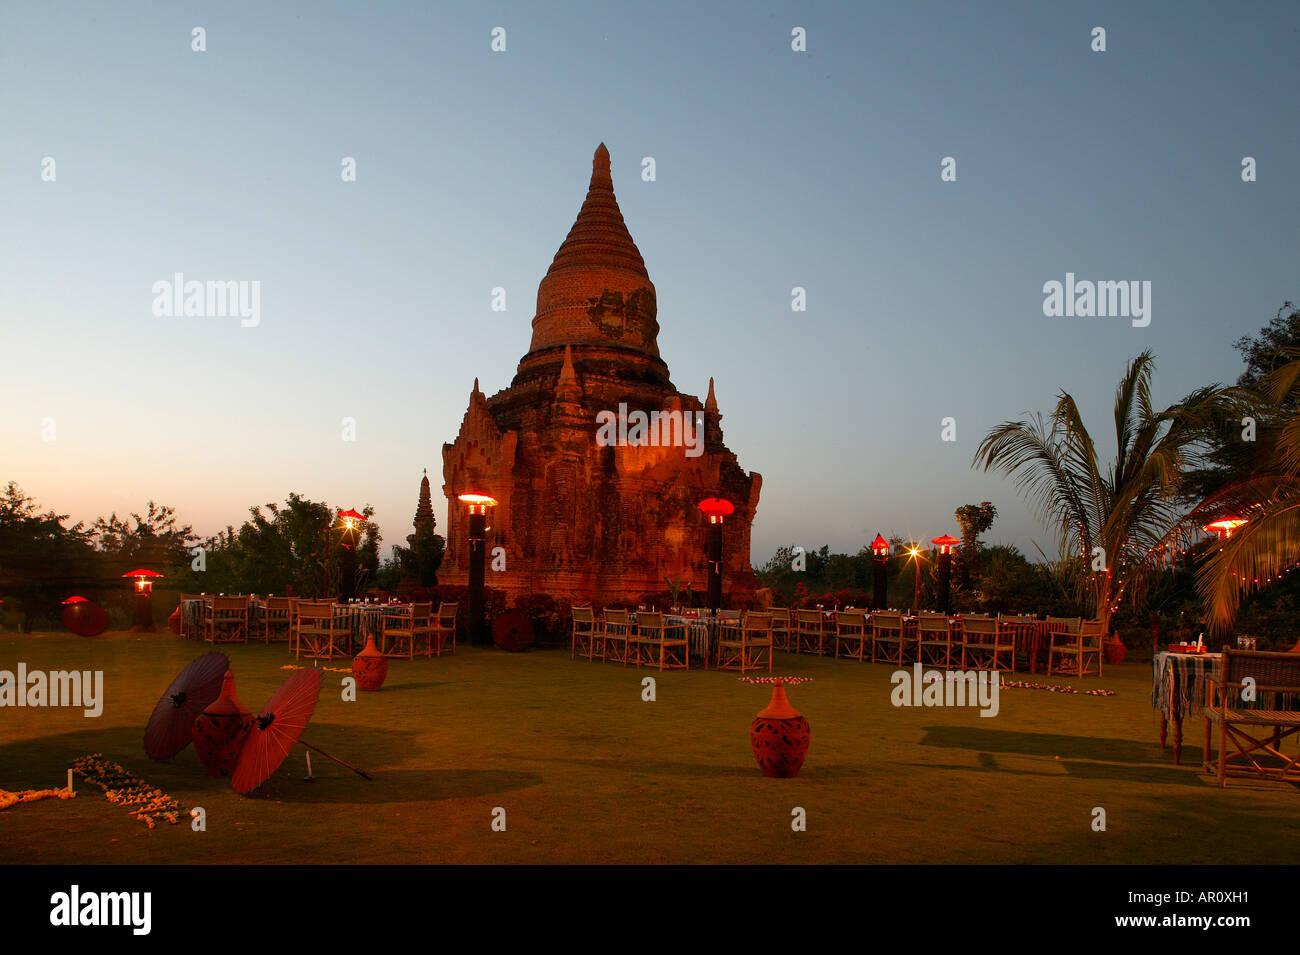 Pagoda im Garten, Thazin Garden Hotel, Bagan, Myanmar Stock Photo ...